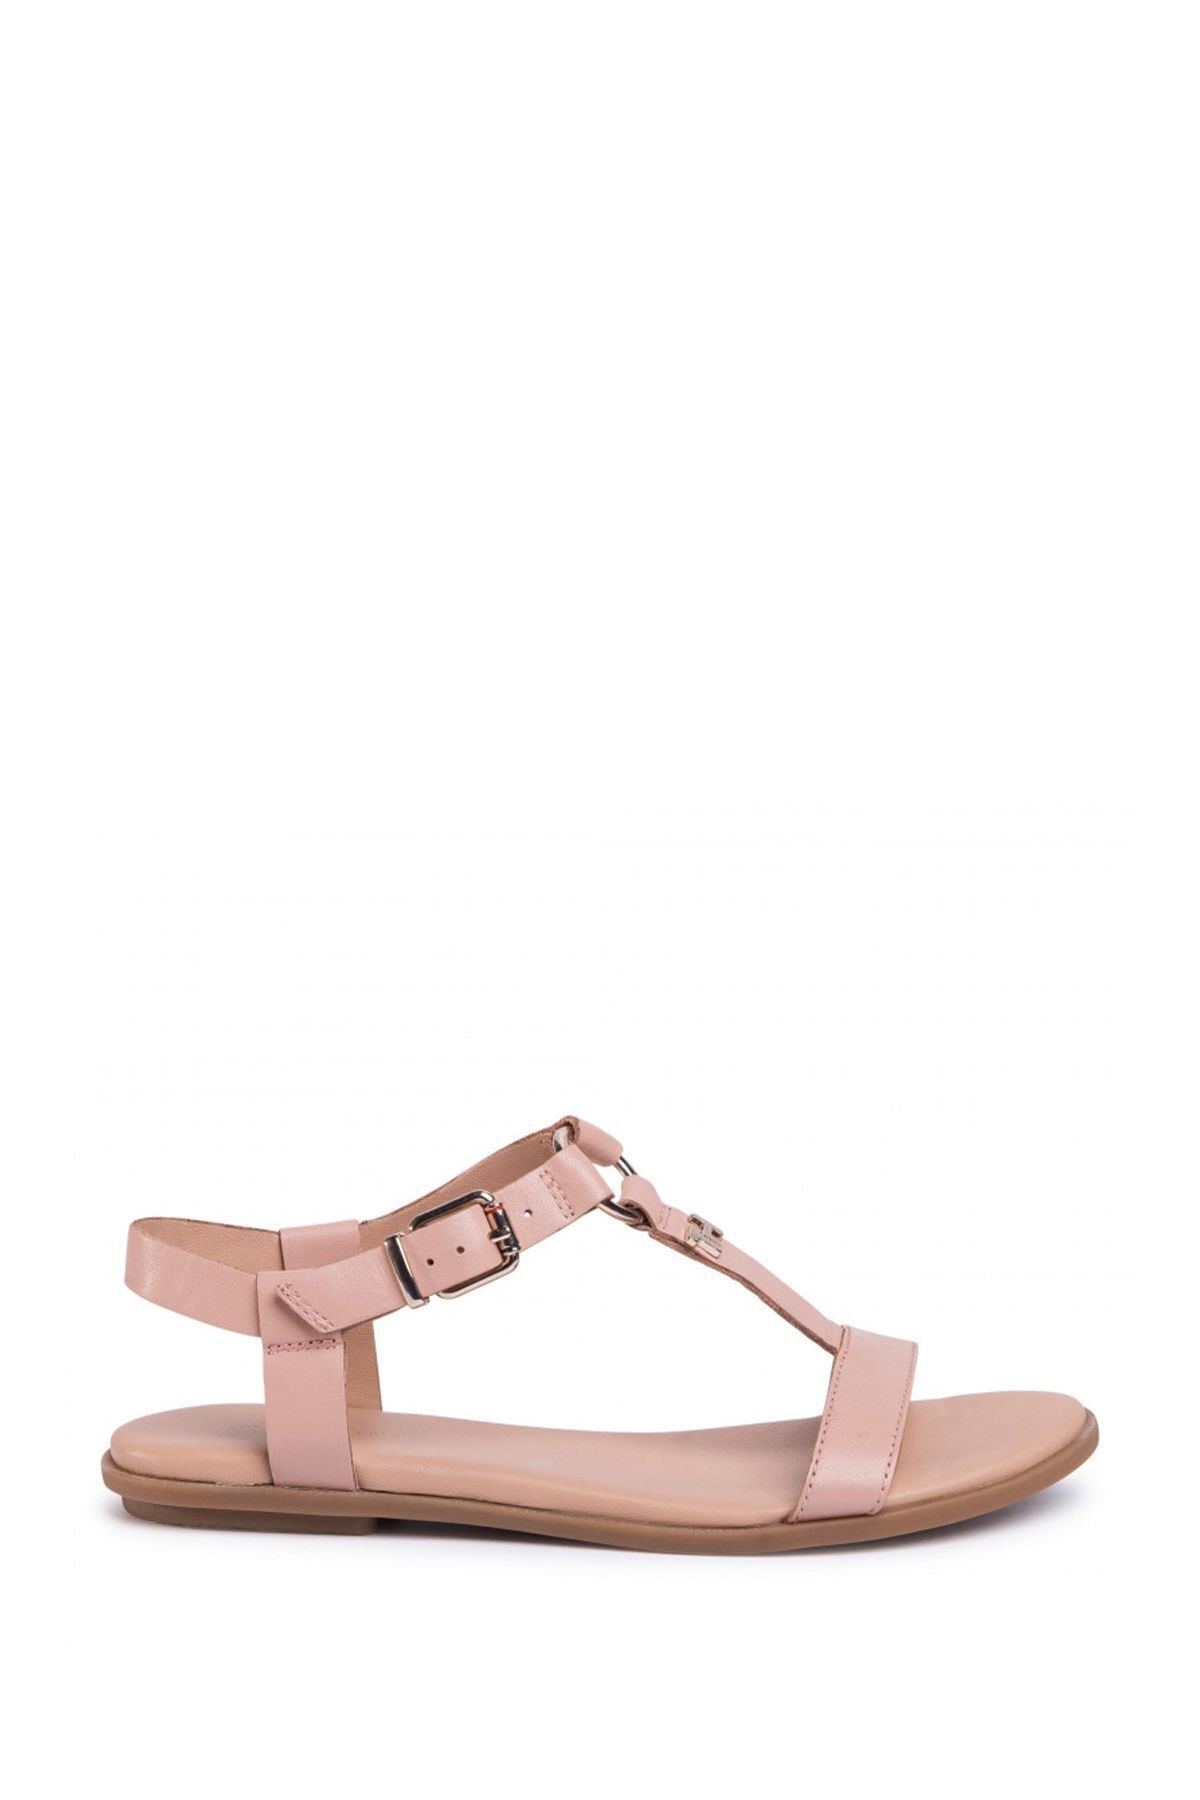 Tommy Hilfiger Kadın Bej Feminine Leather Flat Sandalet Fw0fw04882 2